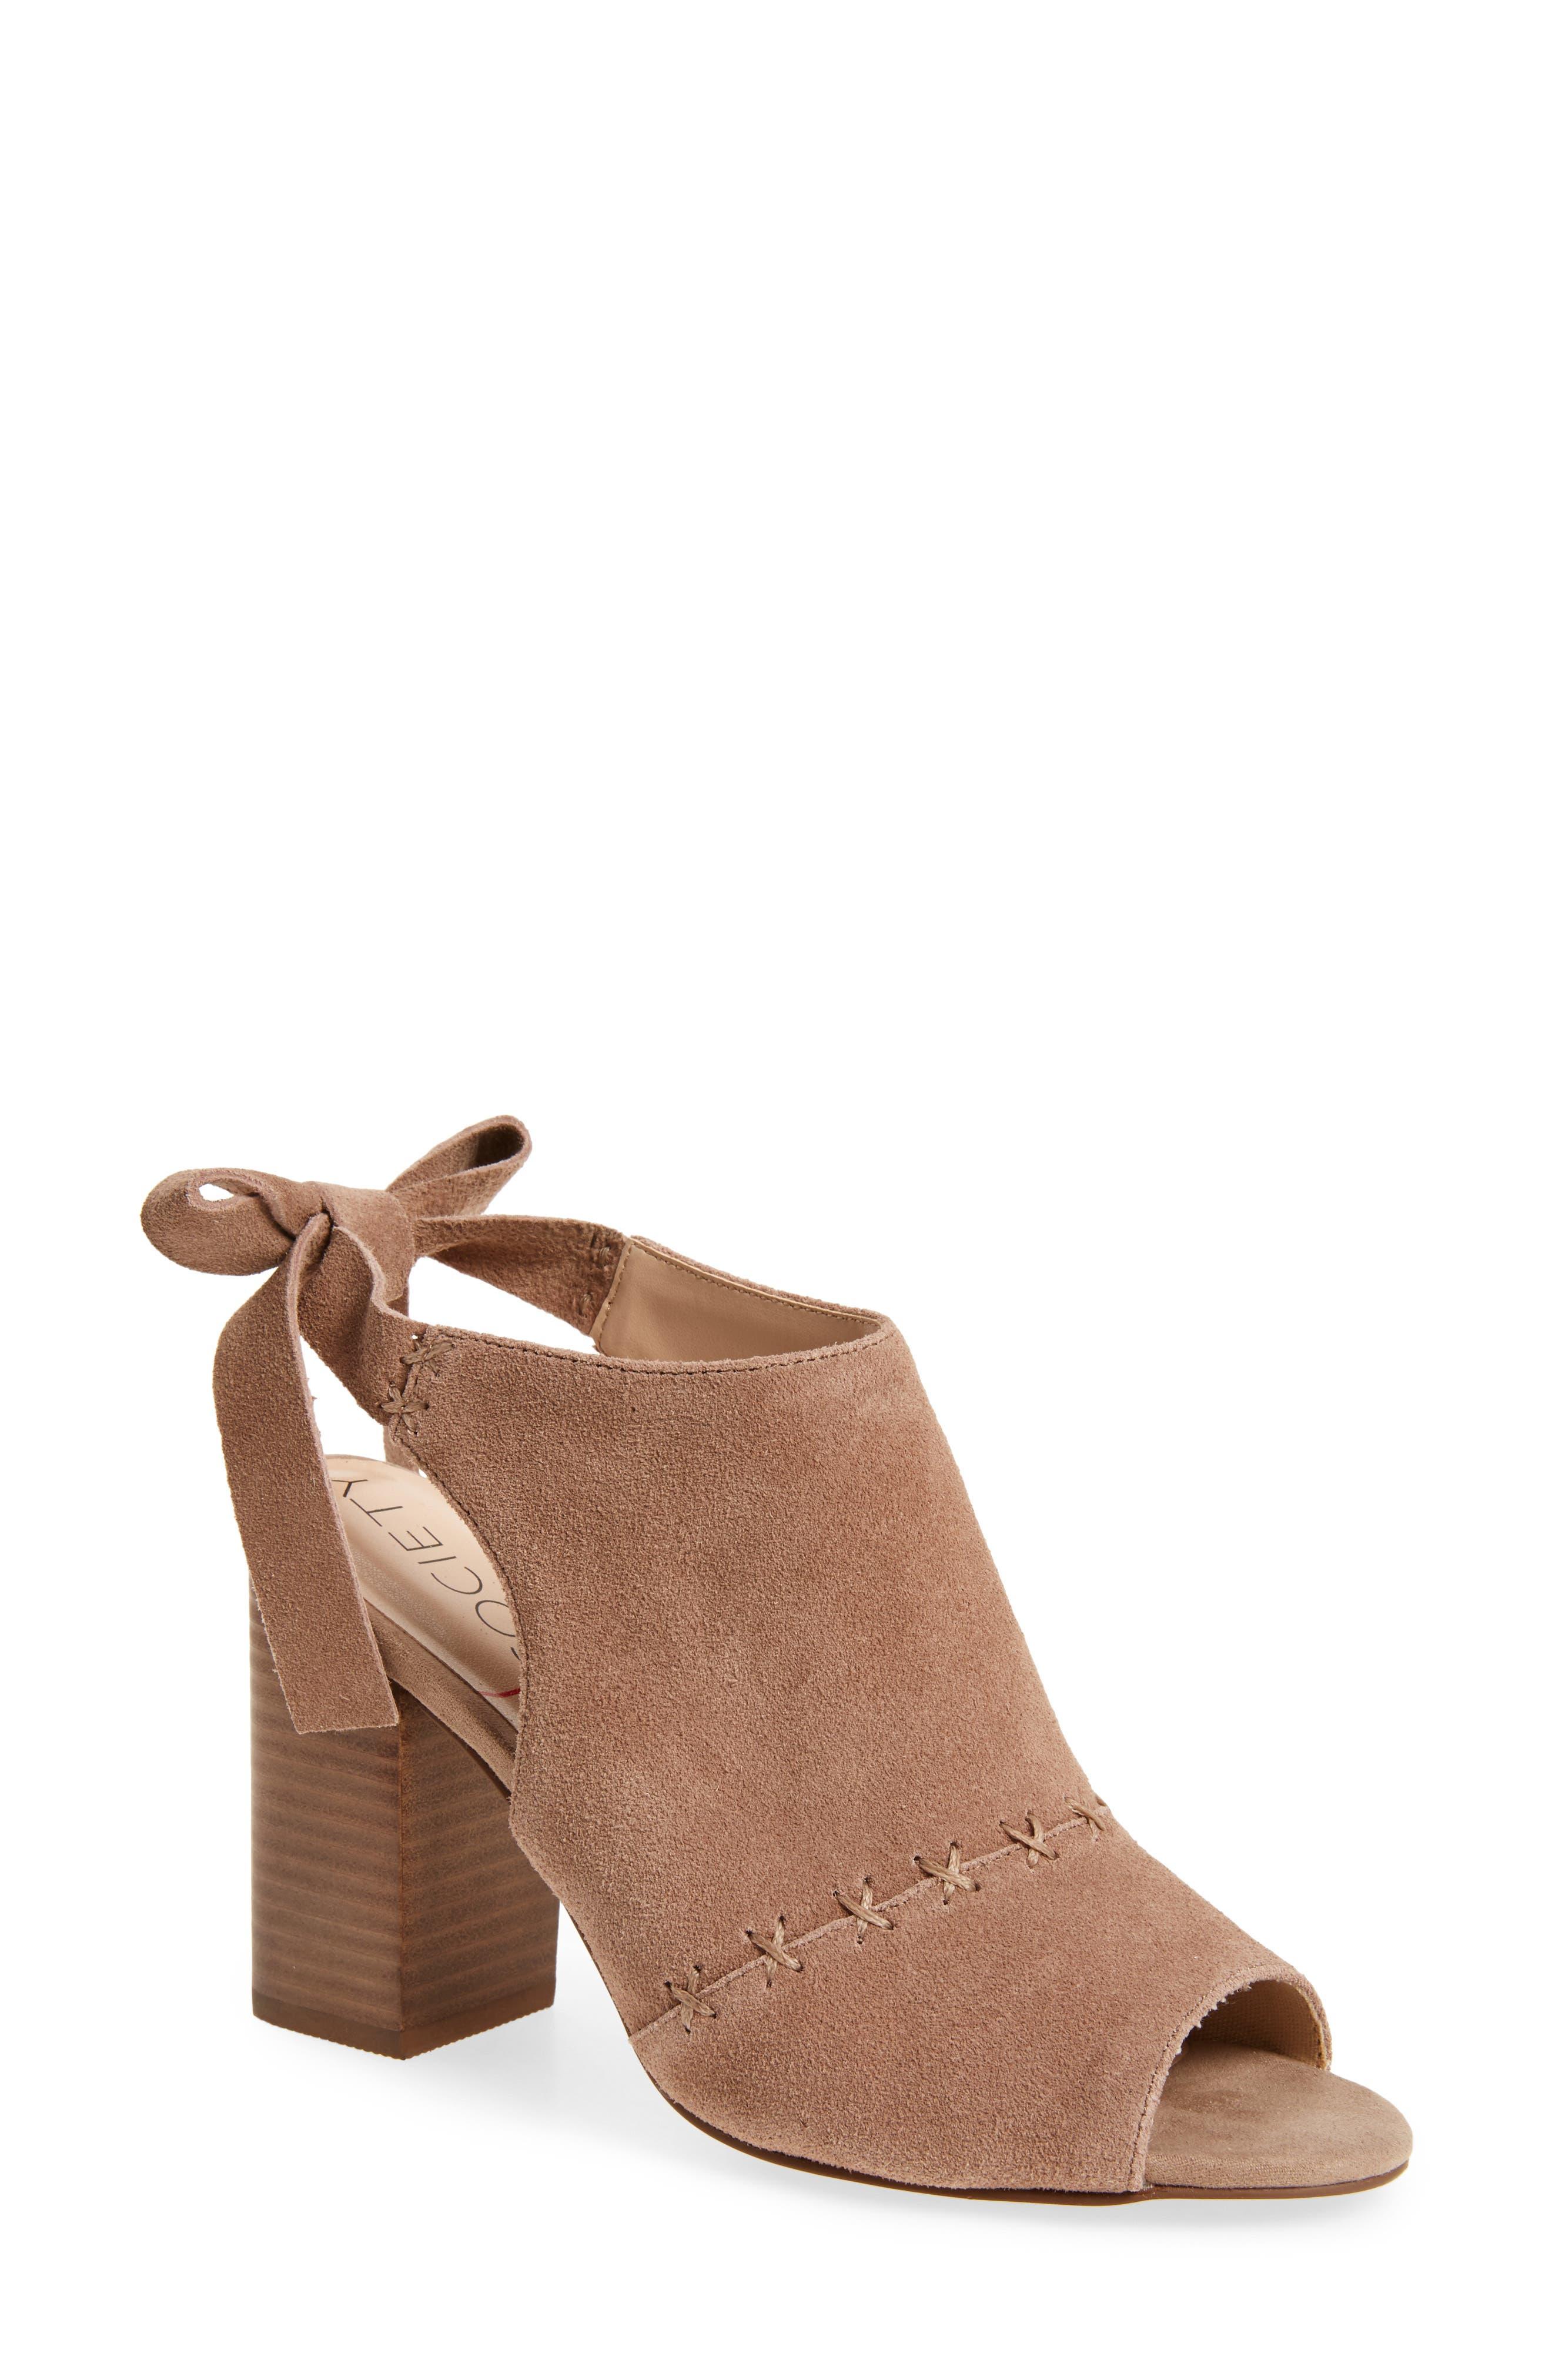 Alternate Image 1 Selected - Sole Society Albany Slingback Sandal (Women)